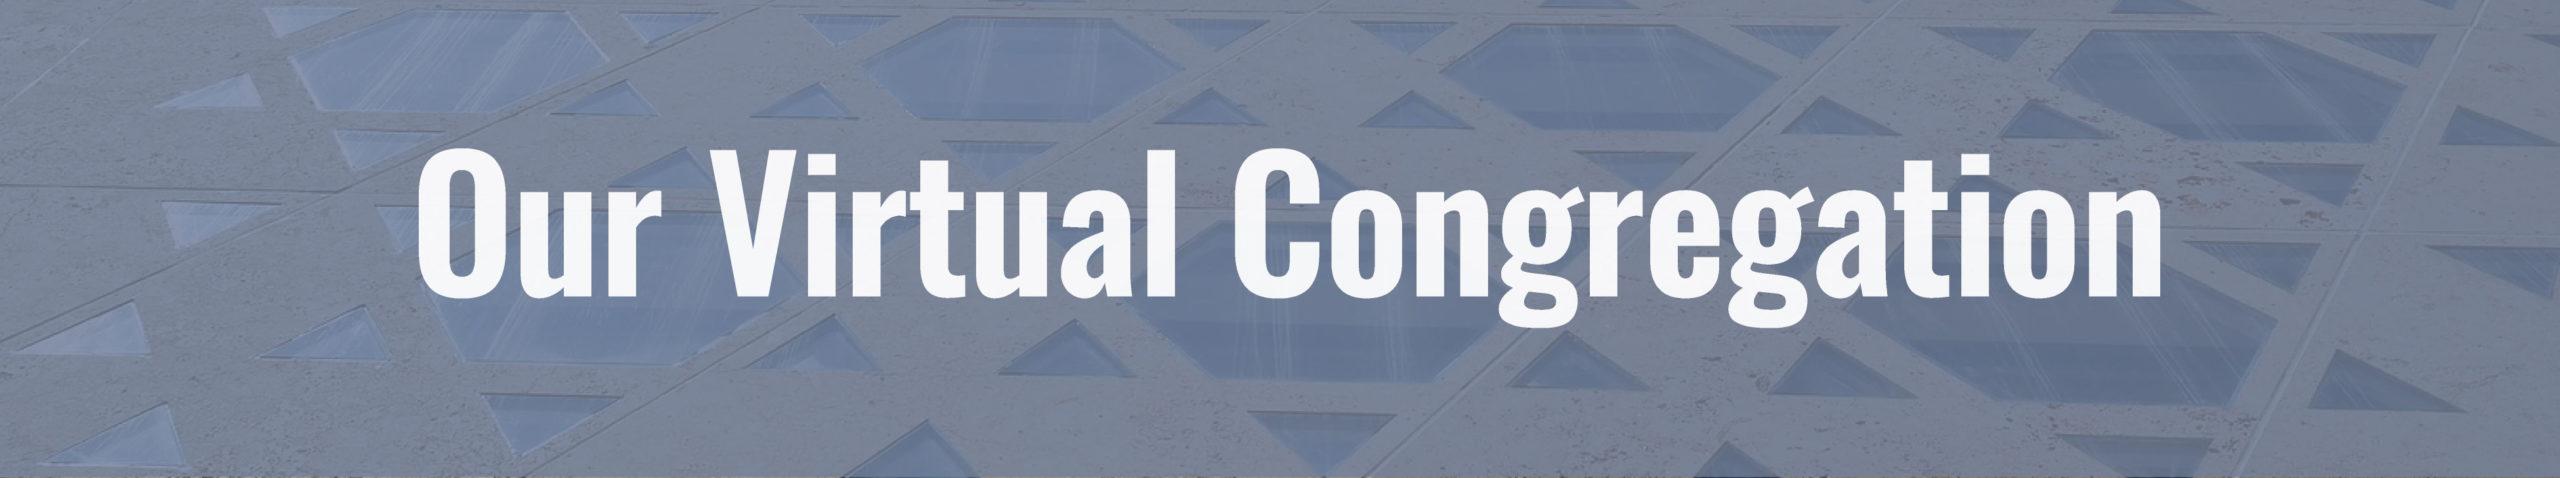 vitrual-congregation-long-link-website